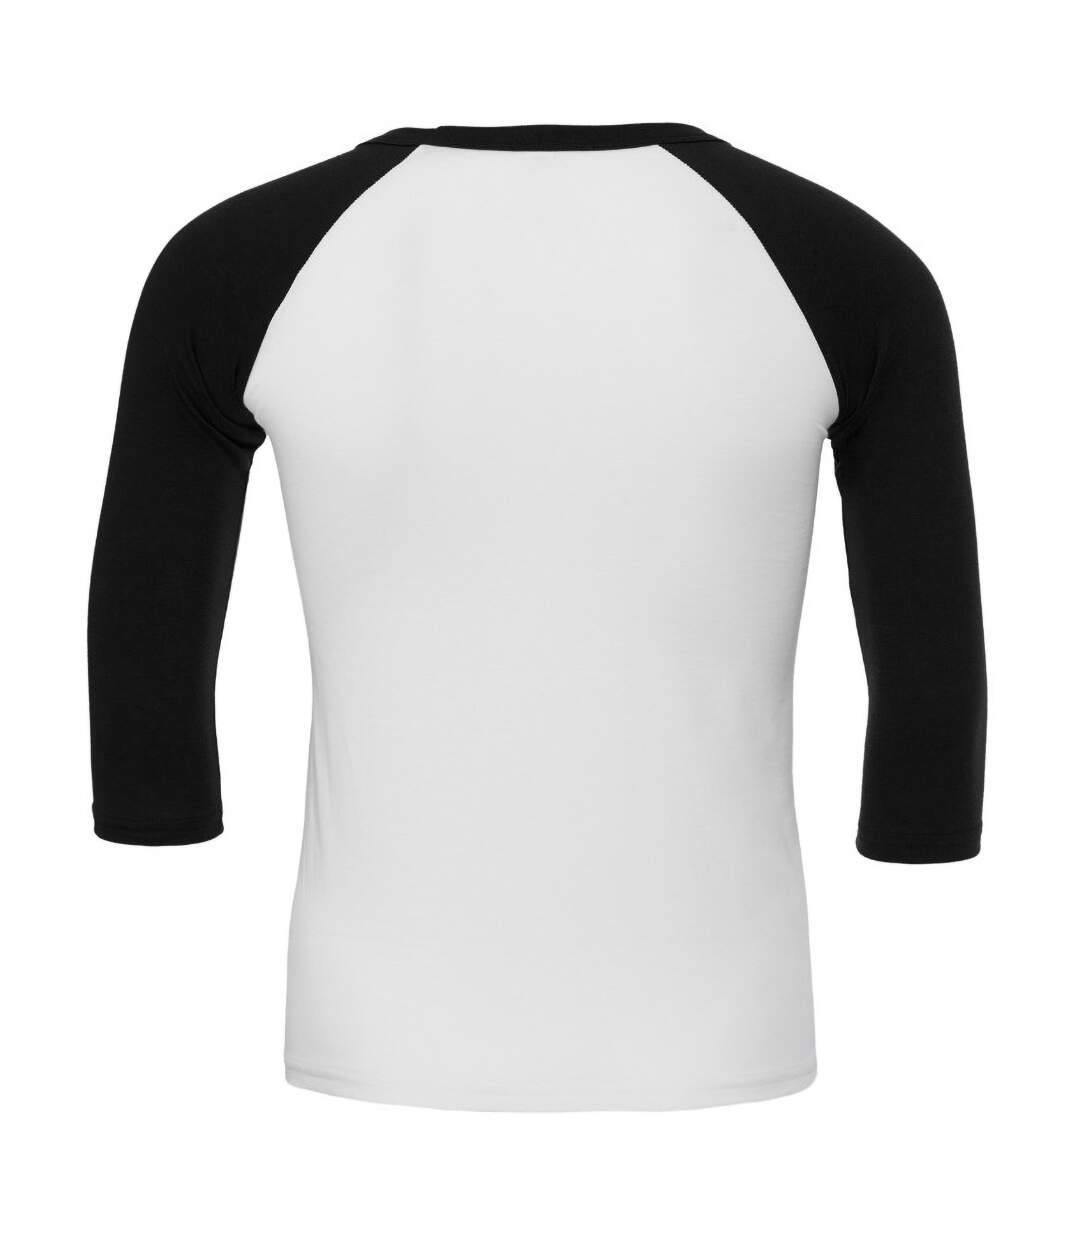 Canvas Mens 3/4 Sleeve Baseball T-Shirt (White/Kelly Green) - UTBC1332